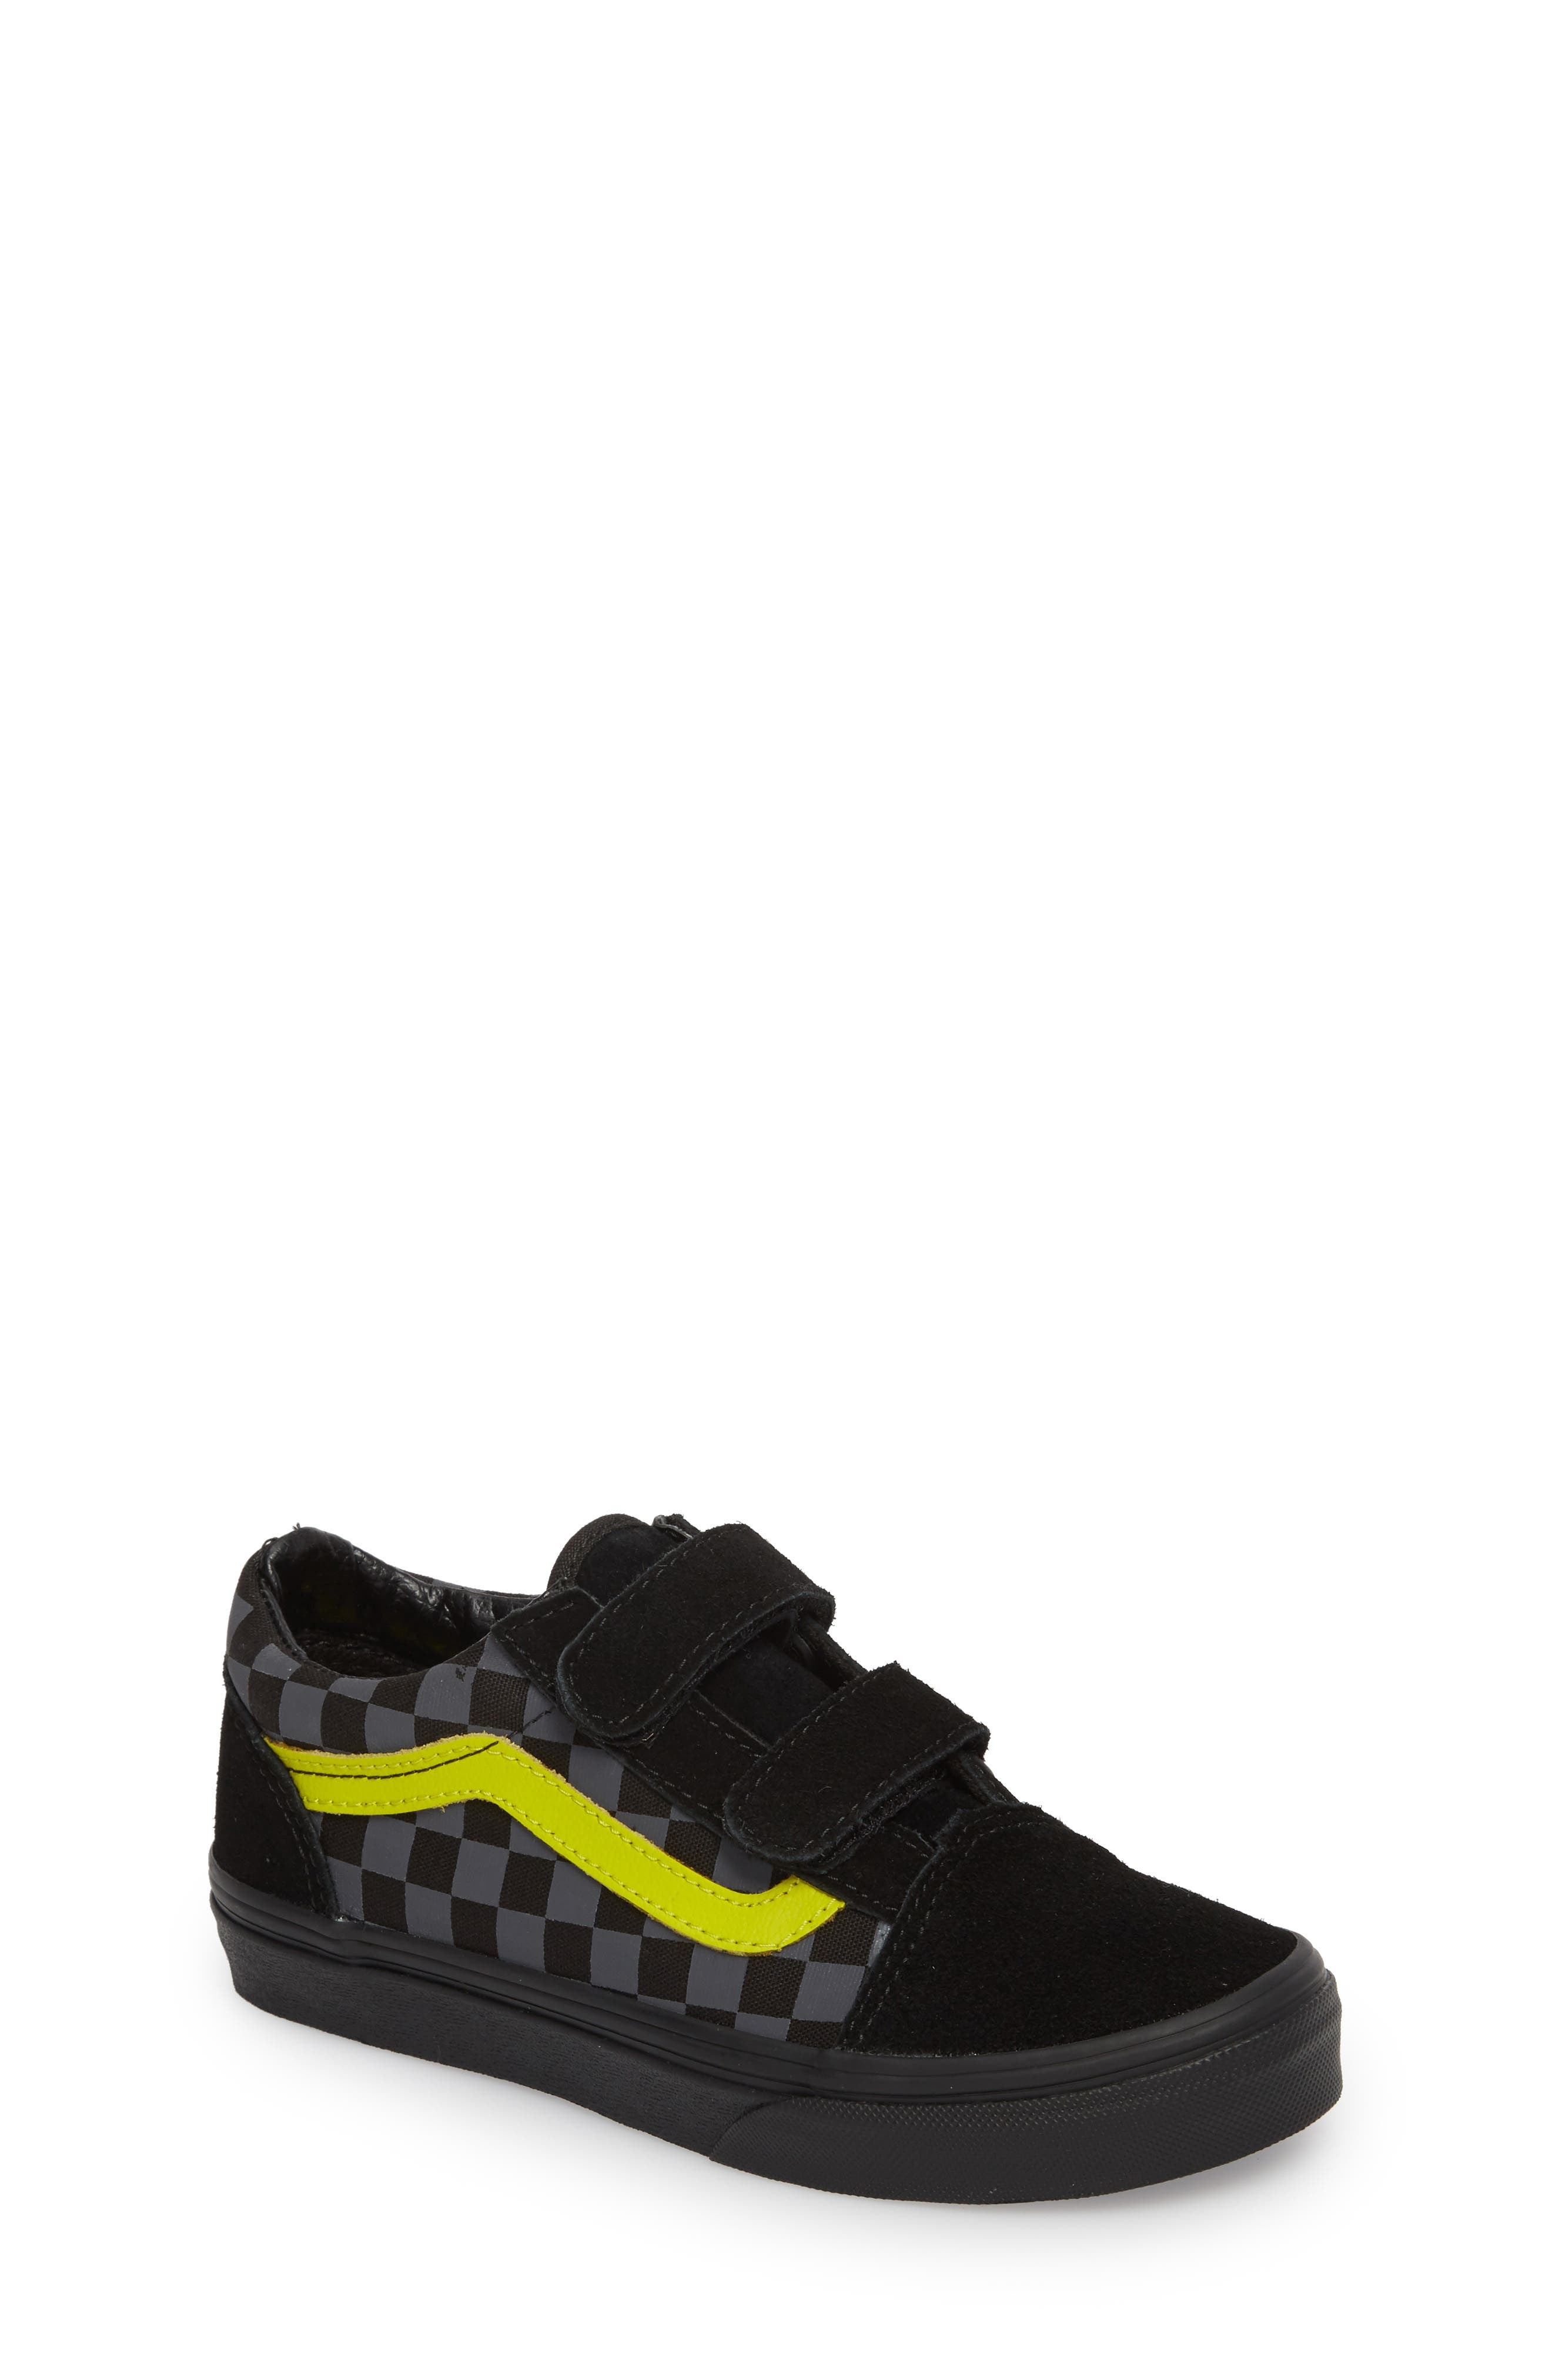 Main Image - Vans Reflective Checkerboard Old Skool V Sneaker (Baby, Walker, Toddler, Little Kid & Big Kid)